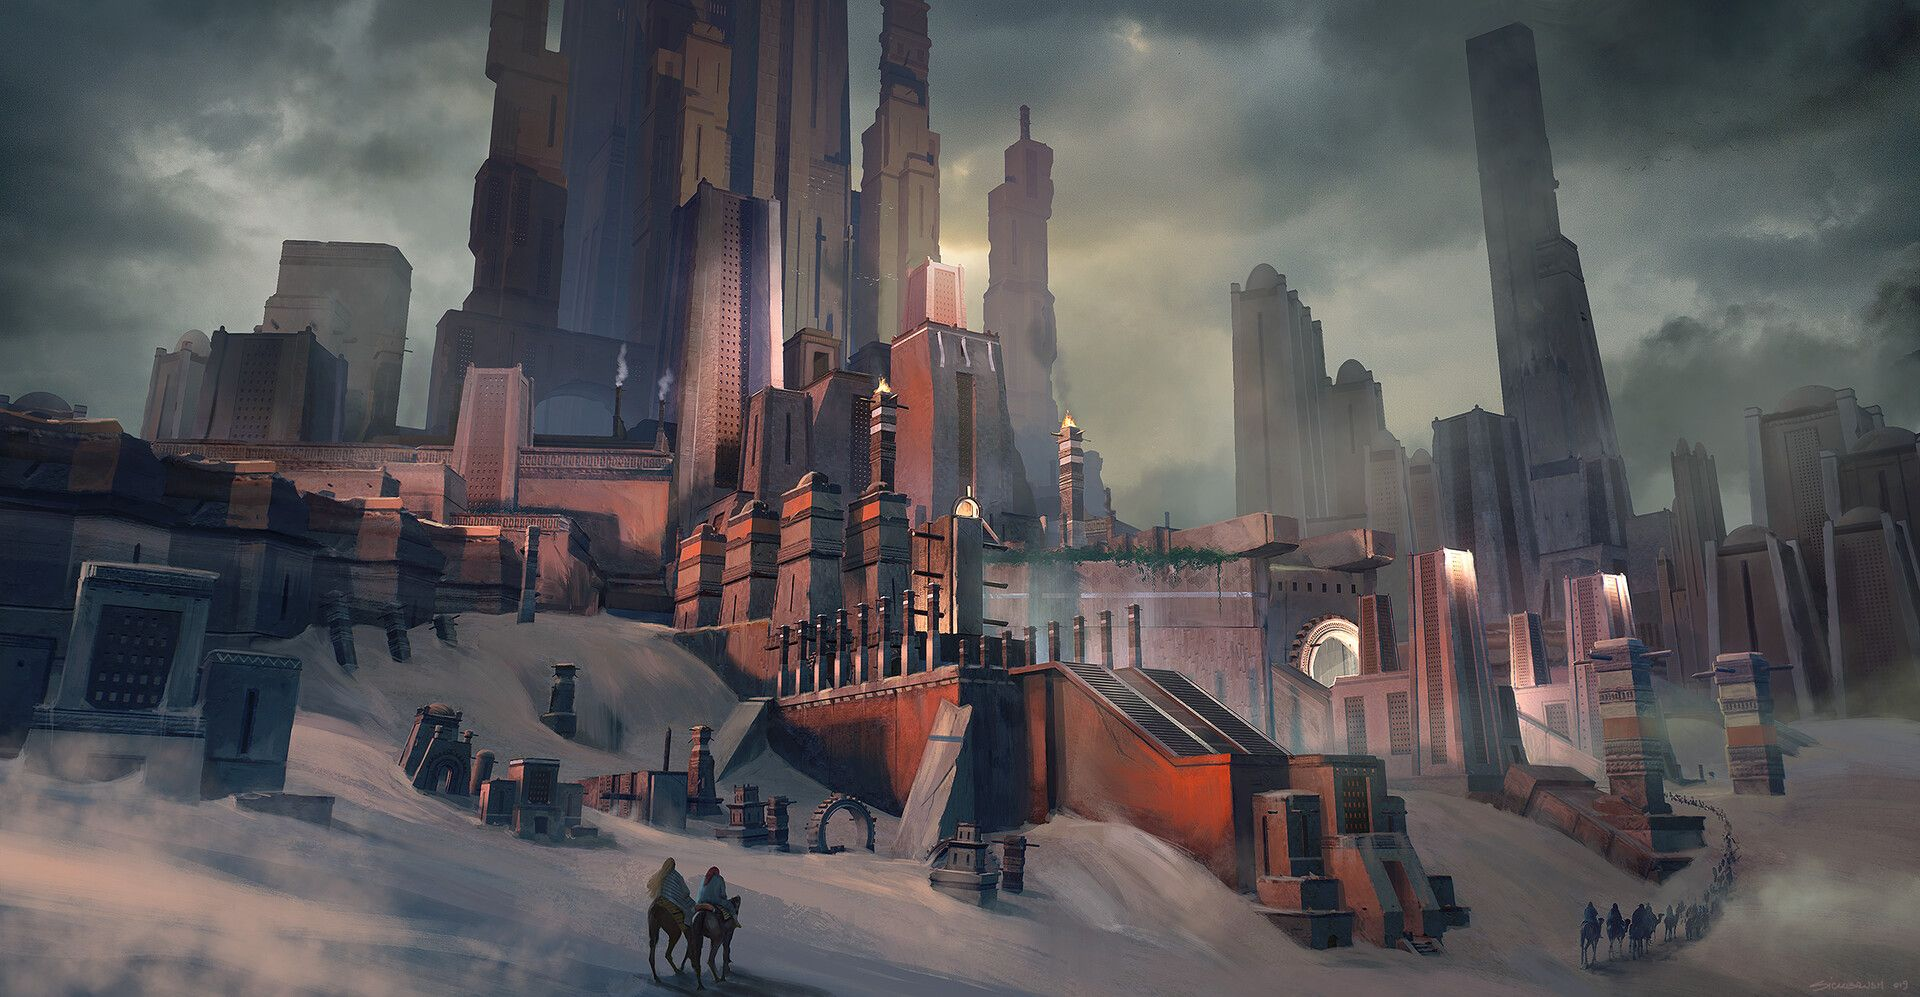 ArtStation - KitBash3d Cover - Ancient Temples, Cristian